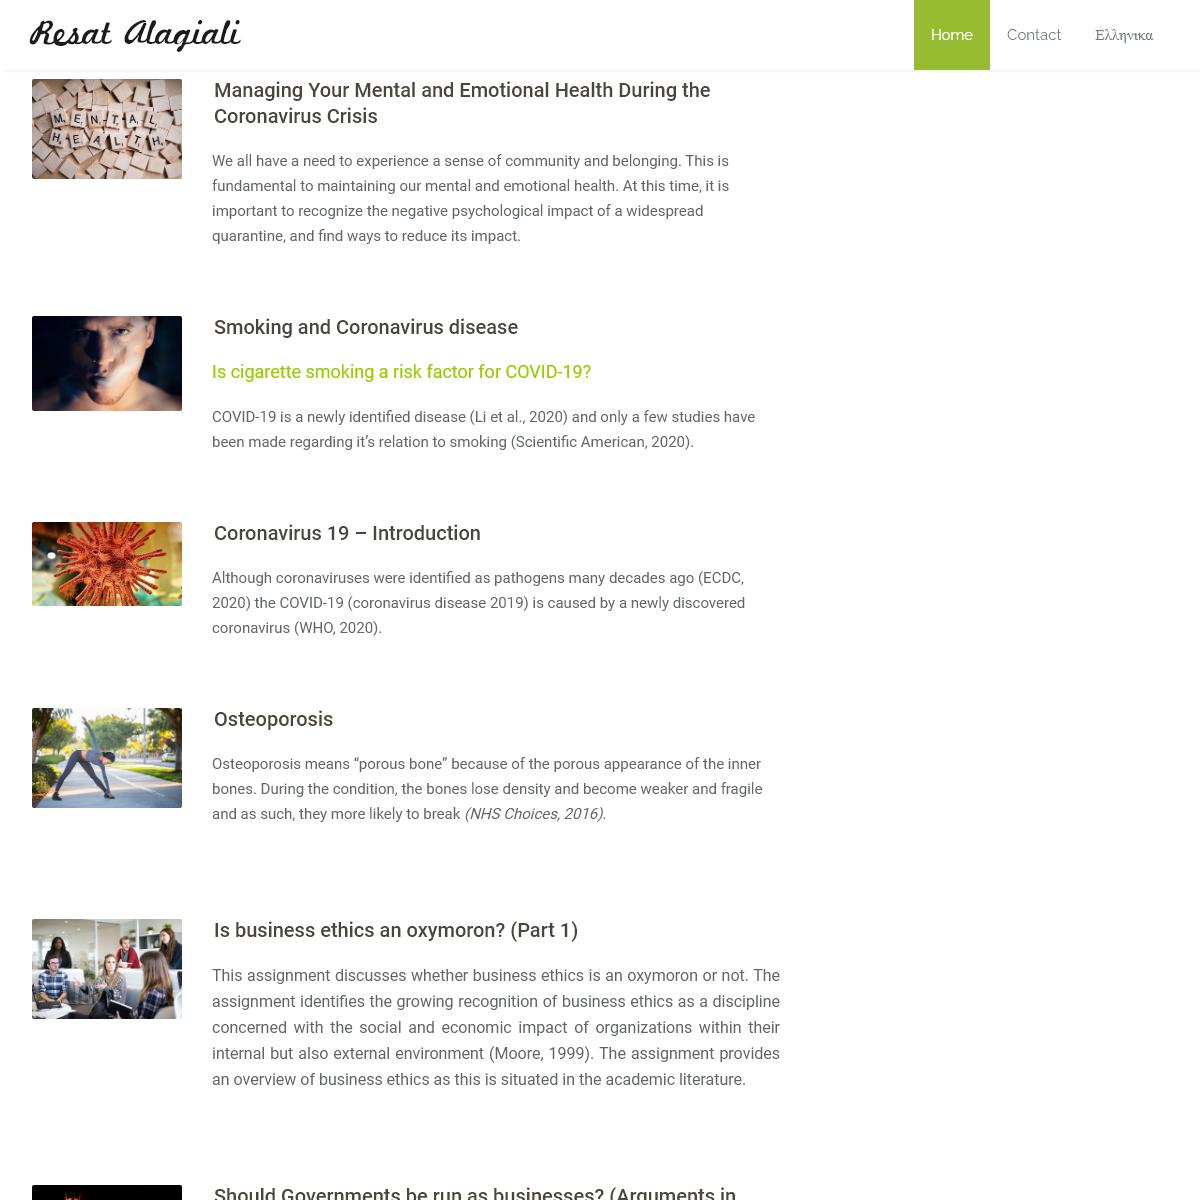 Resat Alagiali - Health, Business & Wellness